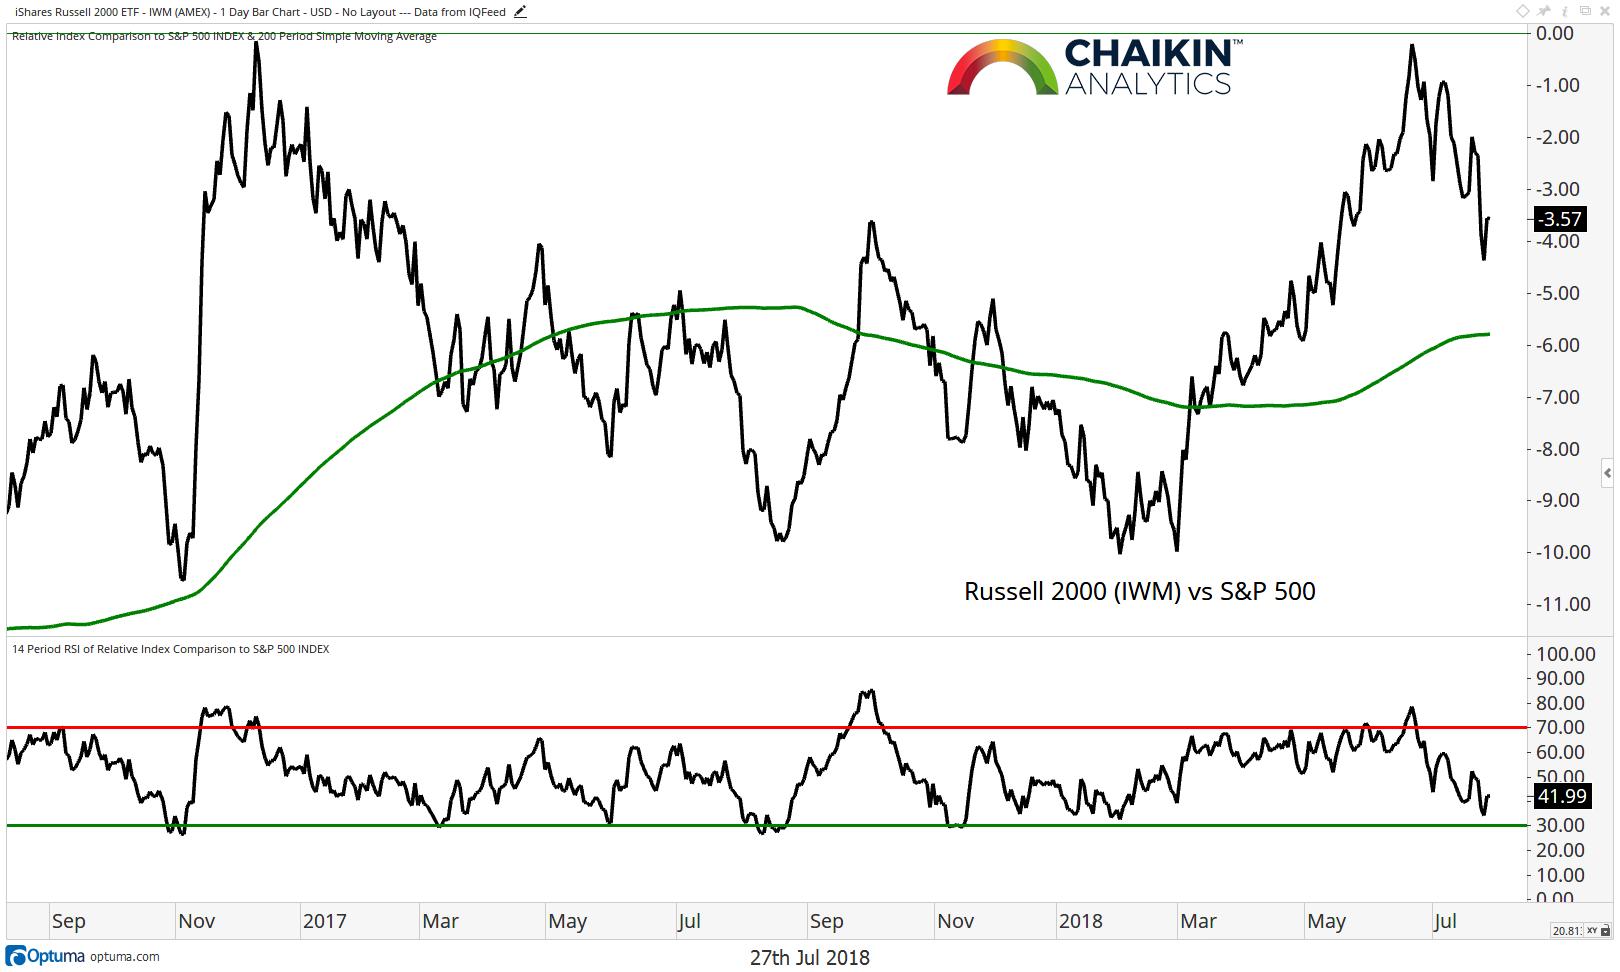 russell 2000 vs s&p 500 ratio chart performance analysis_year 2018